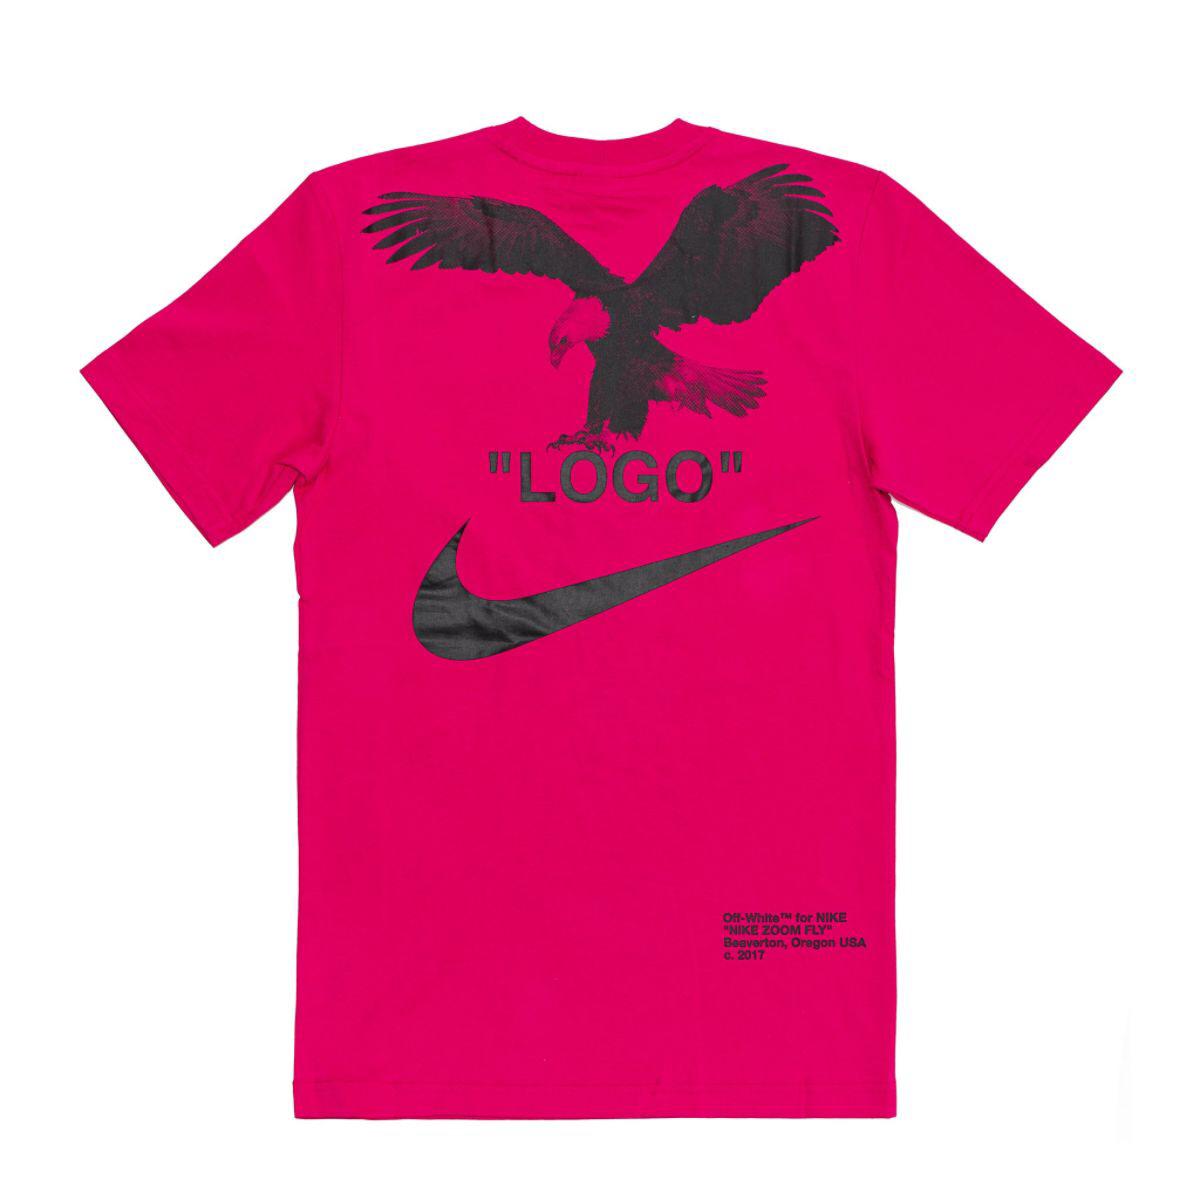 OFF-WHITE x Nike NRG A6 Tee Pink Rush